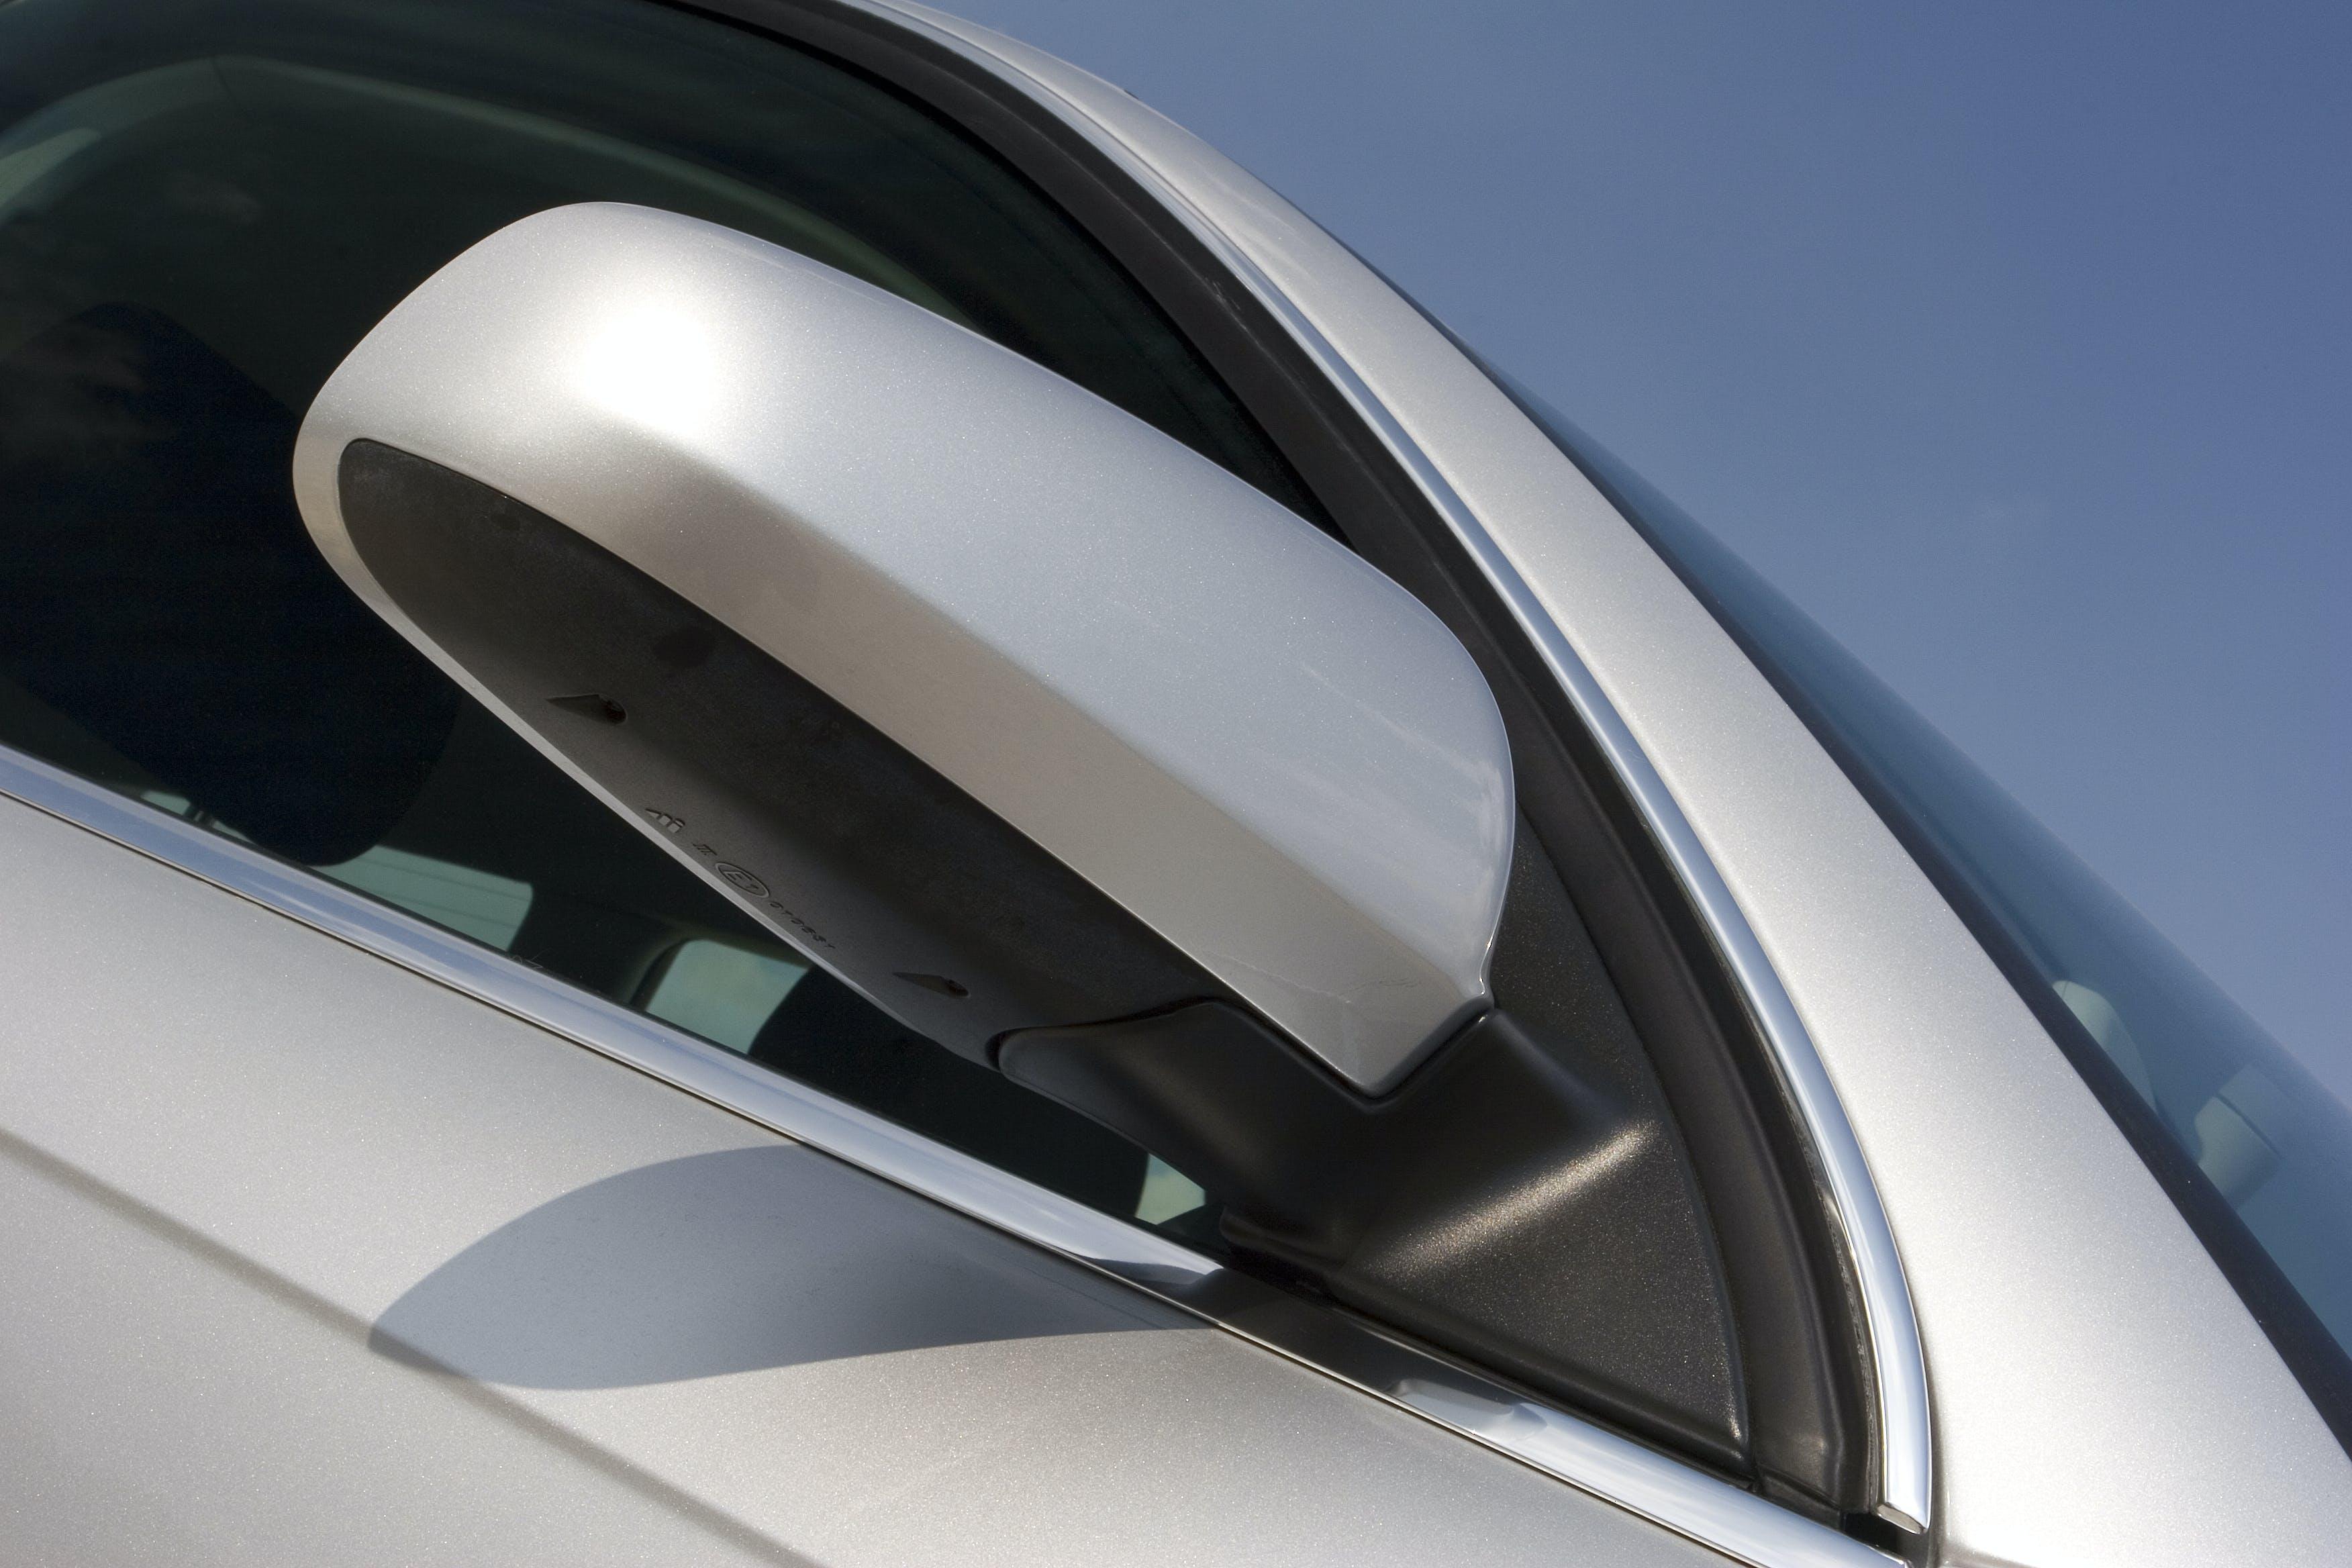 White Car Side View Mirror